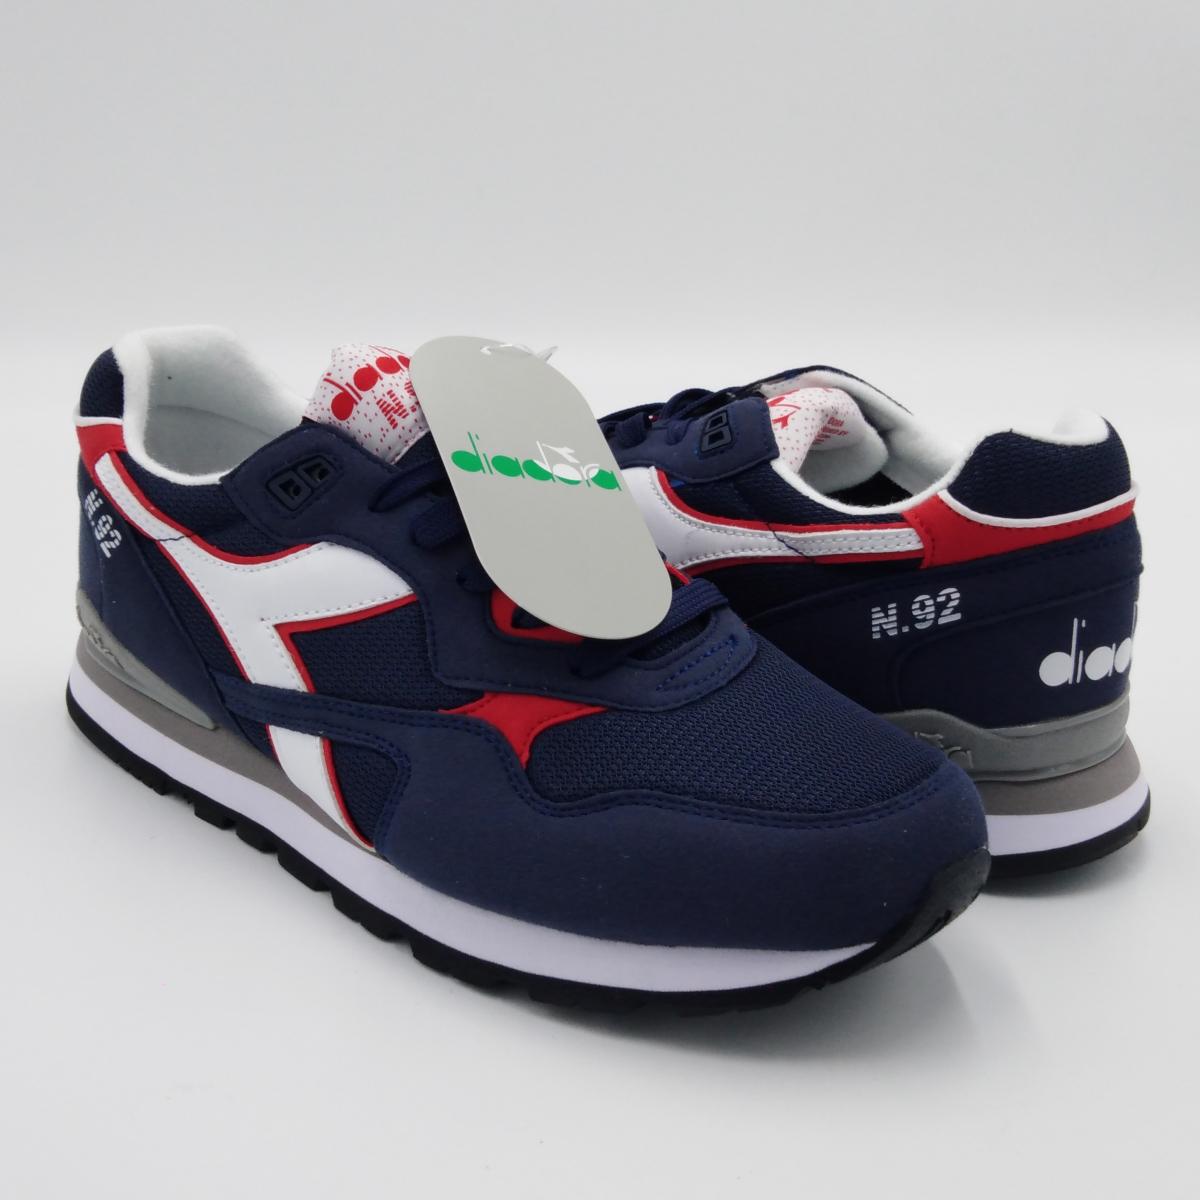 Diadora n. 92 -Sneaker...